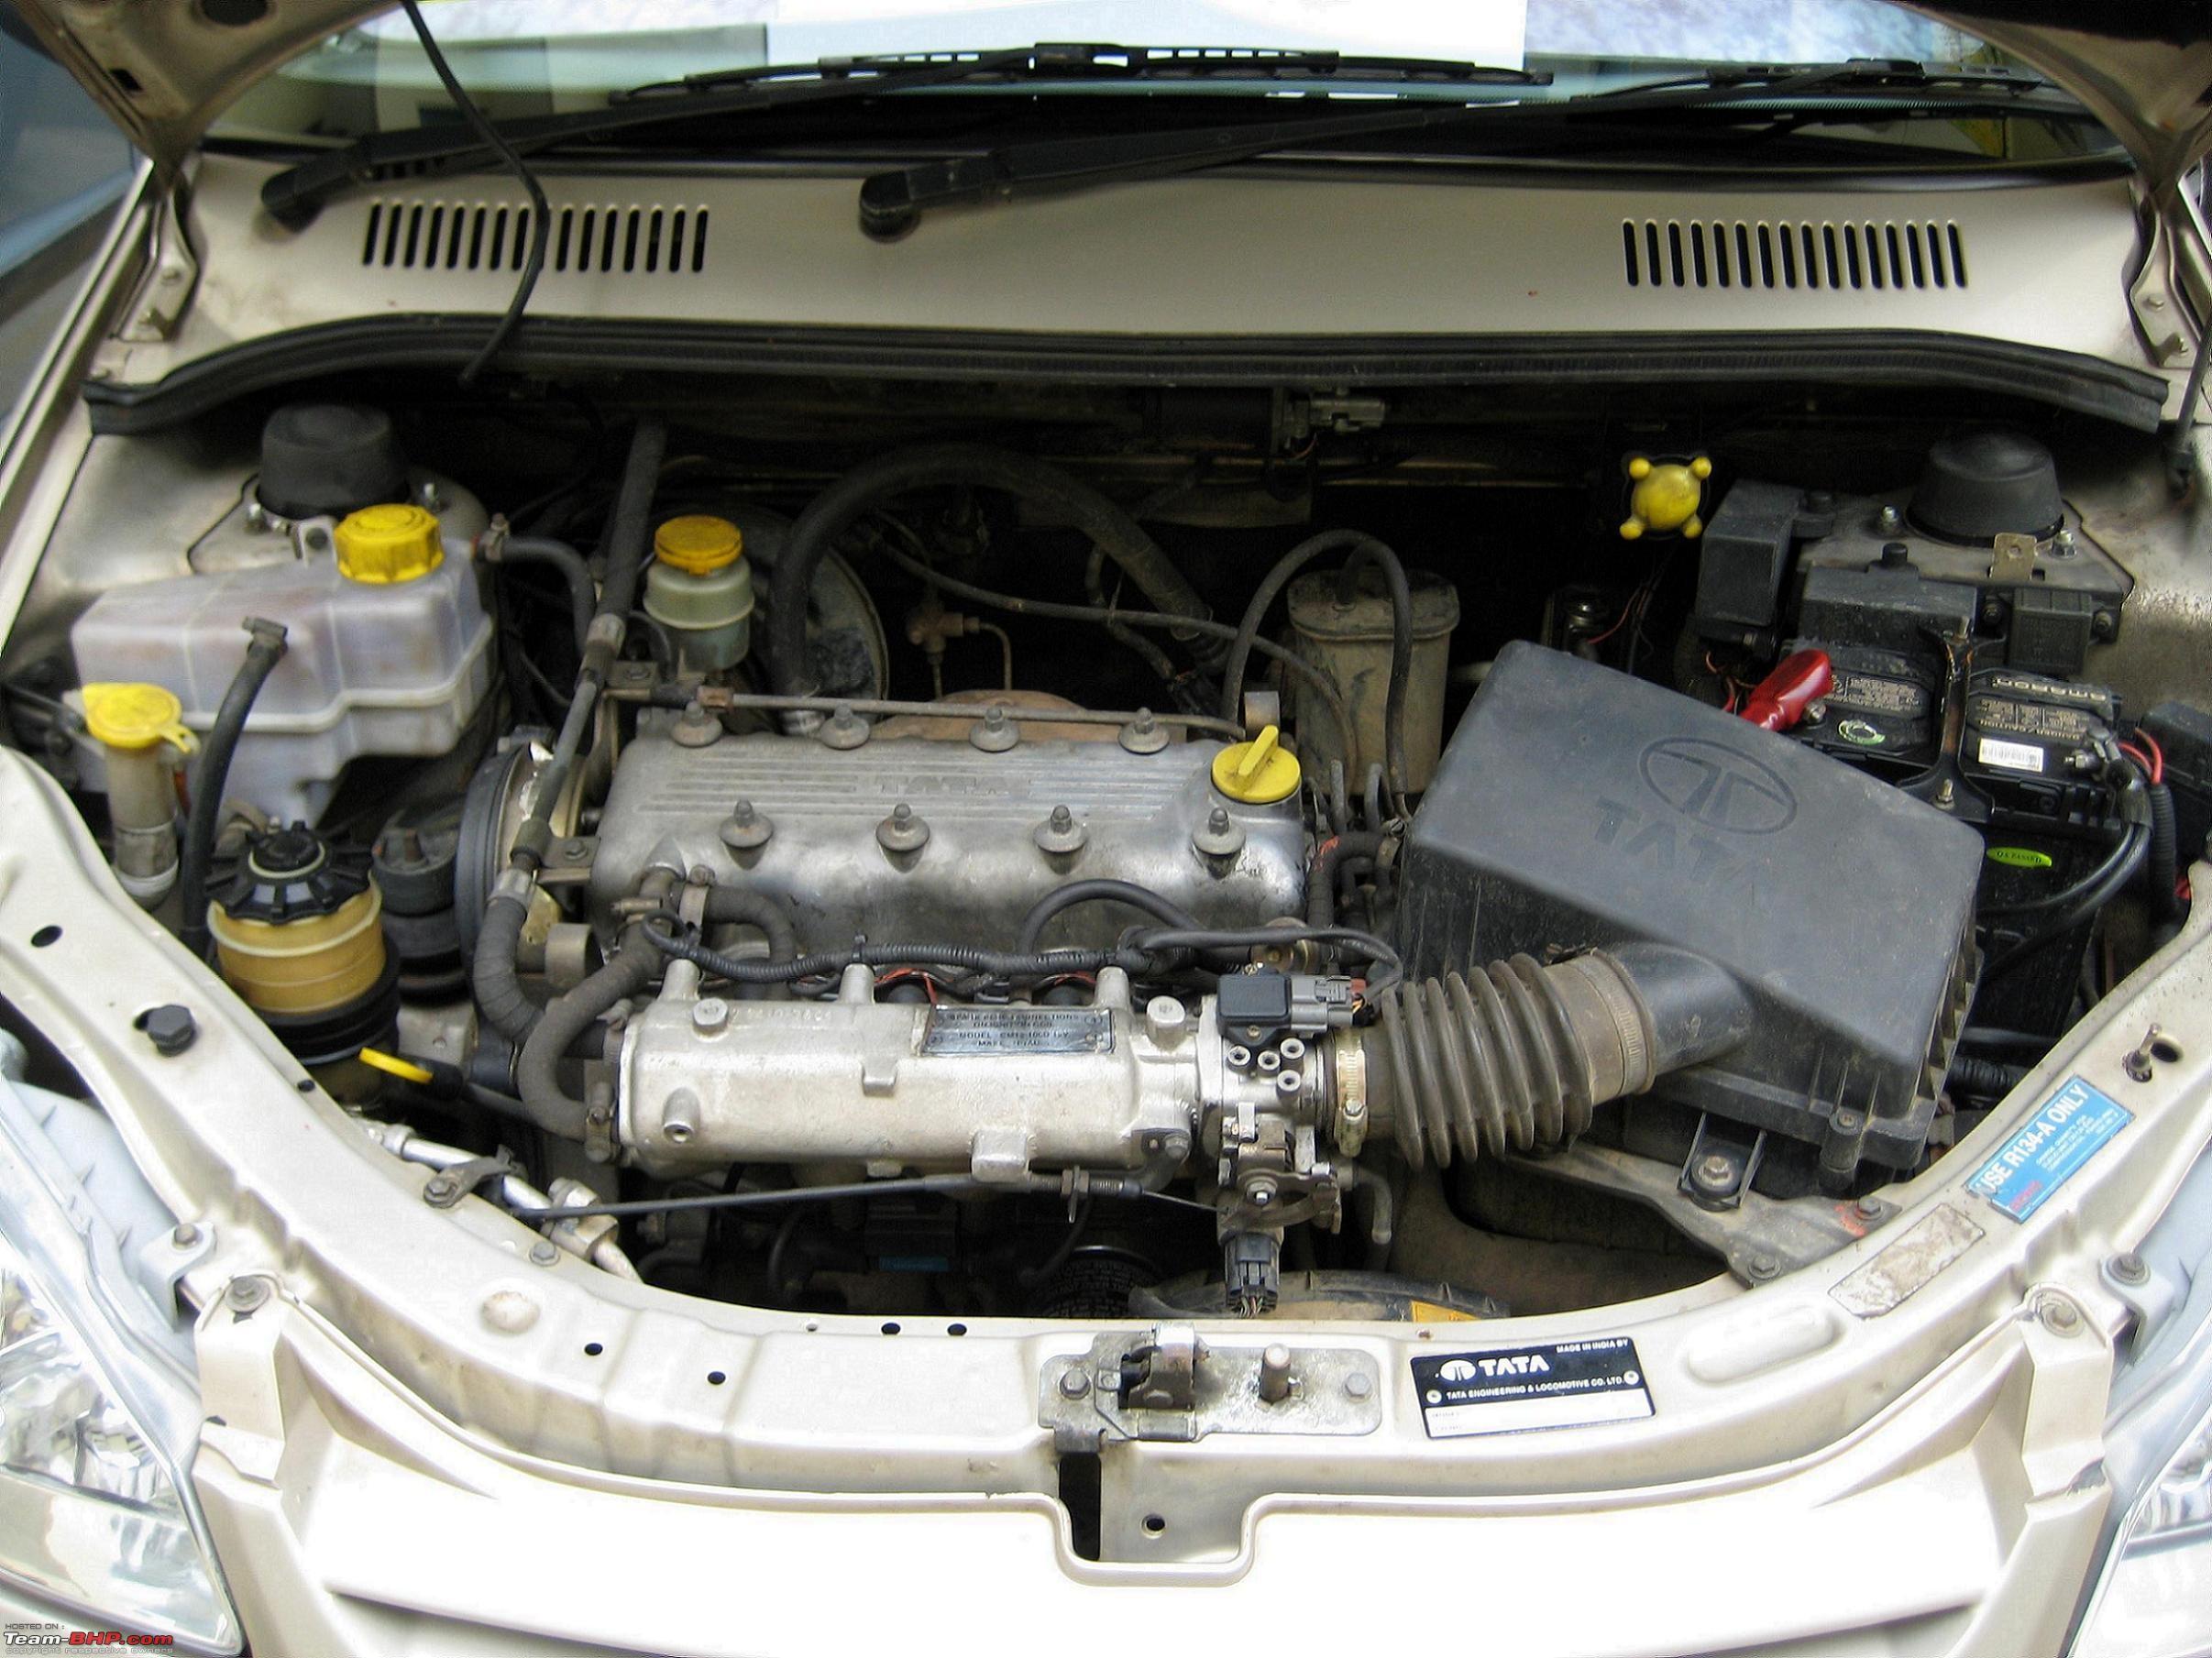 Diagram Of Car Under Hood